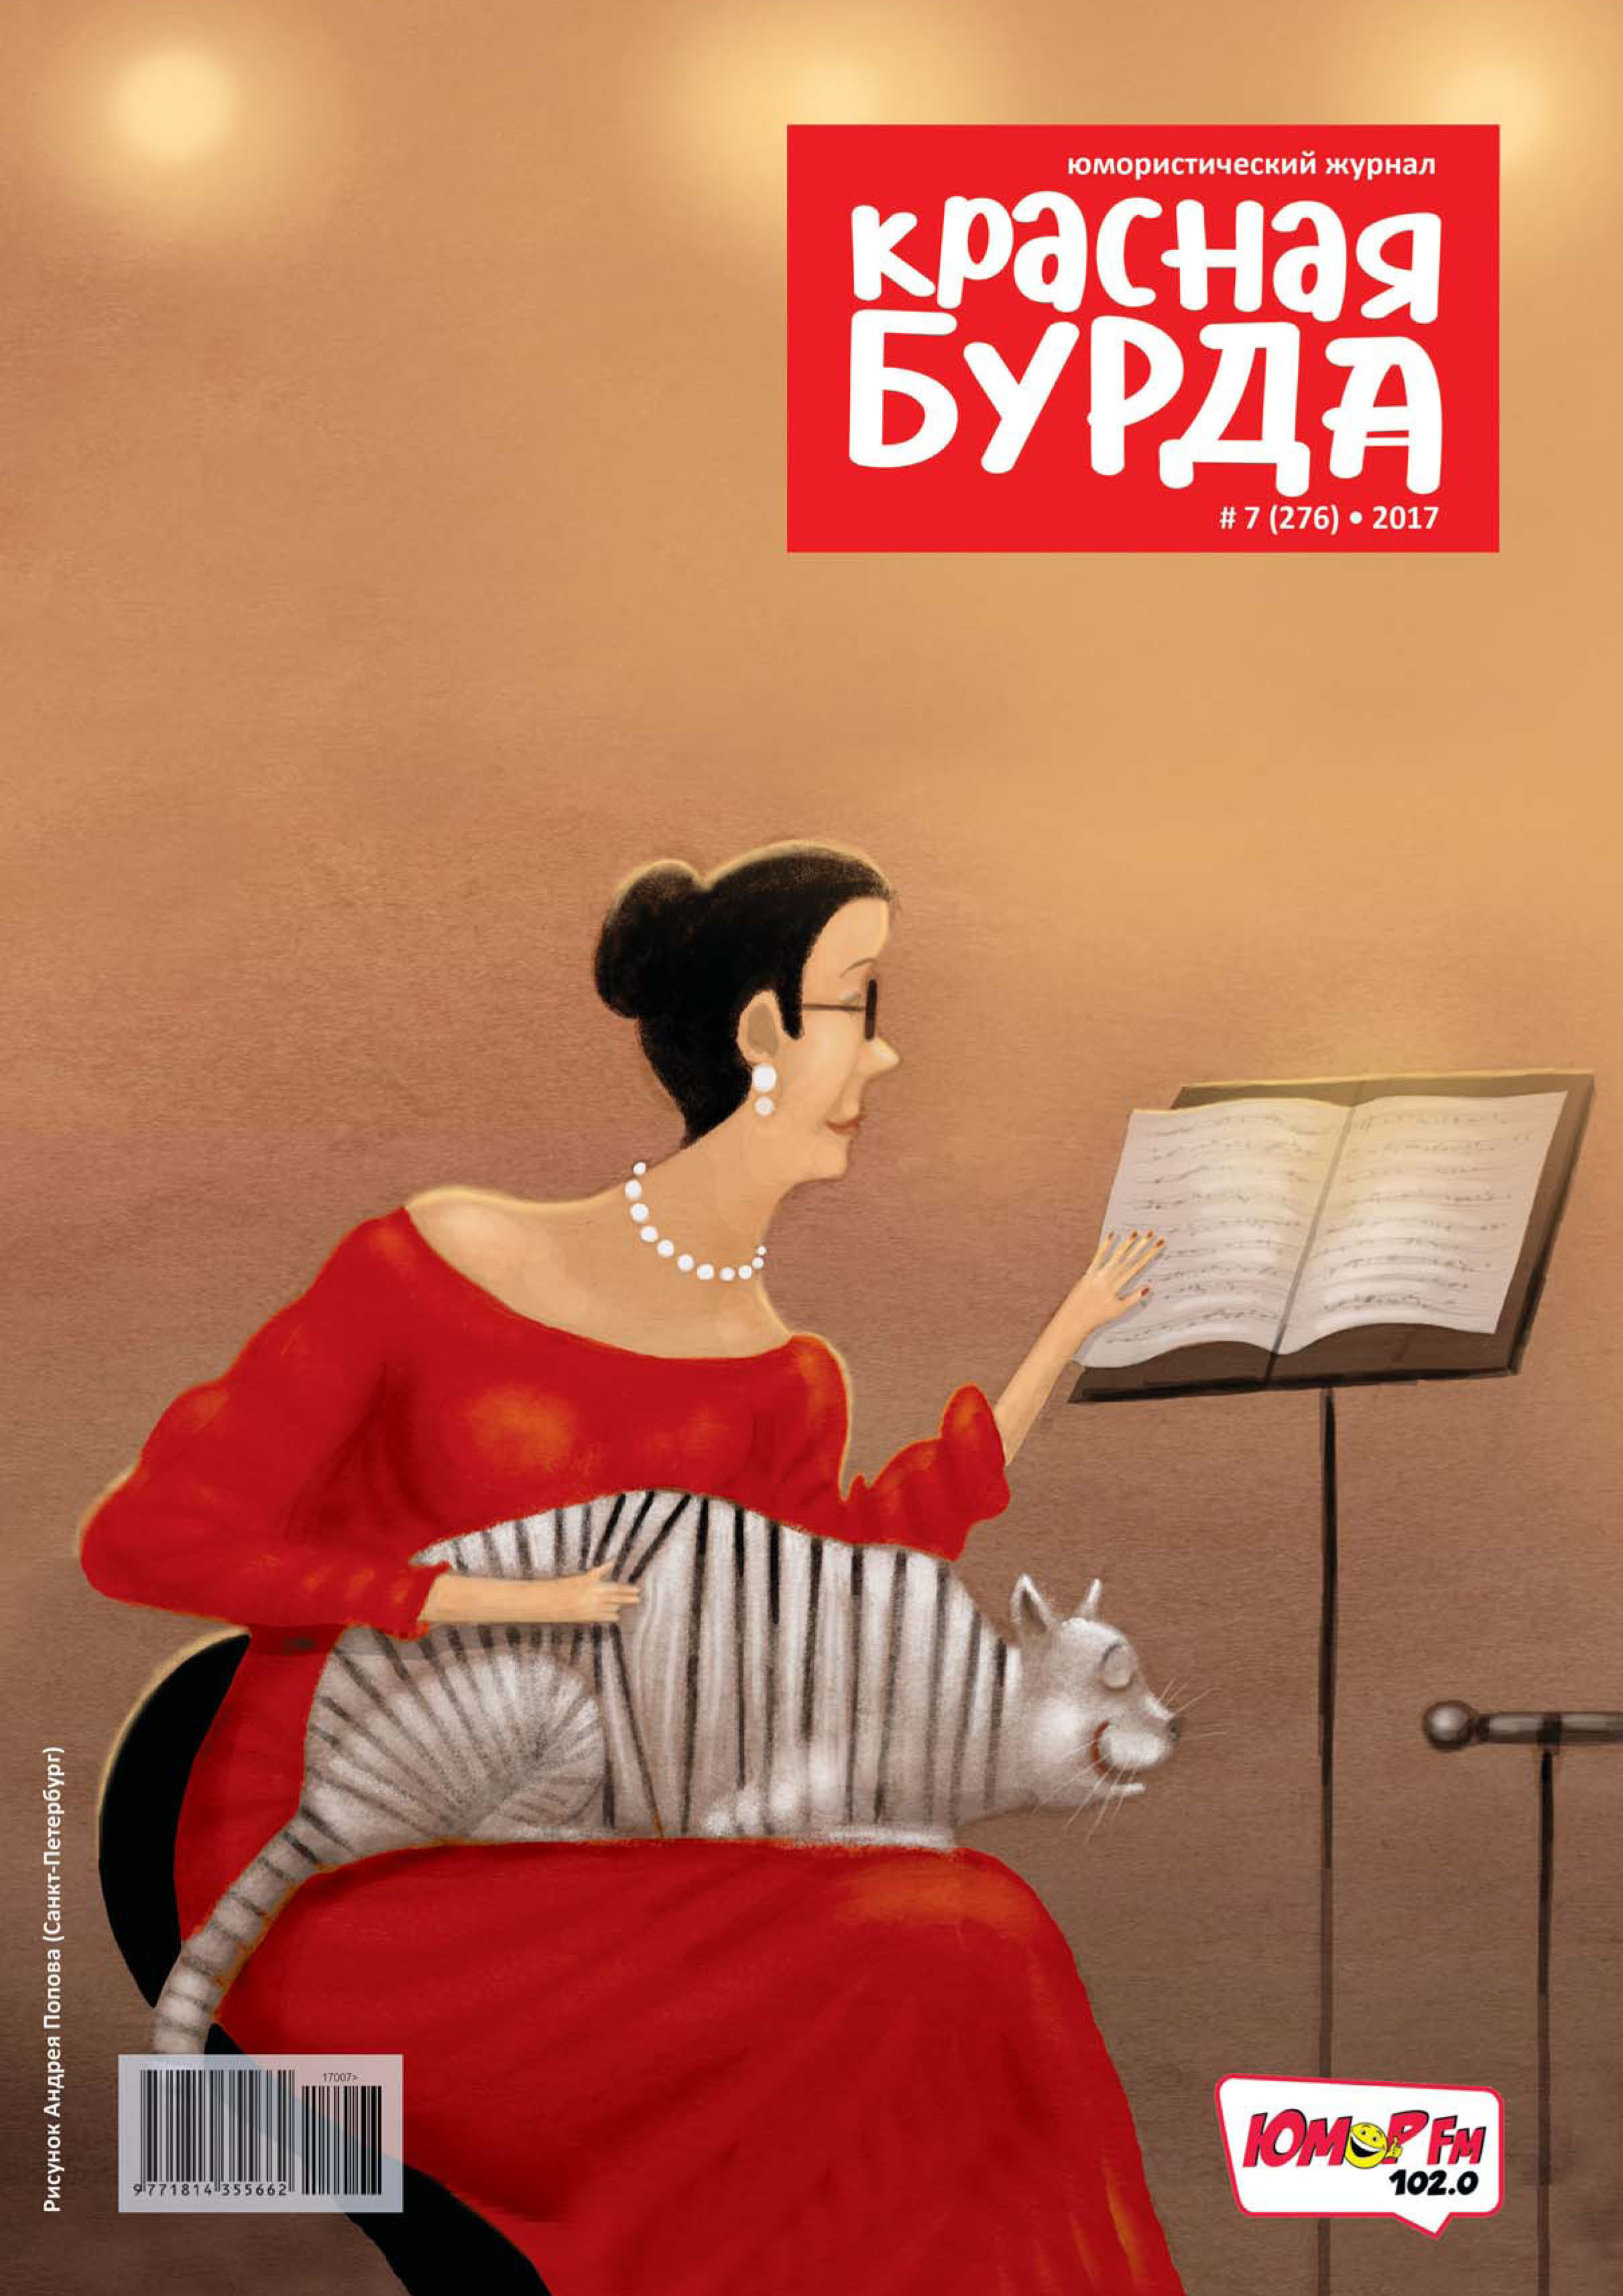 Красная бурда. Юмористический журнал. №07/2017